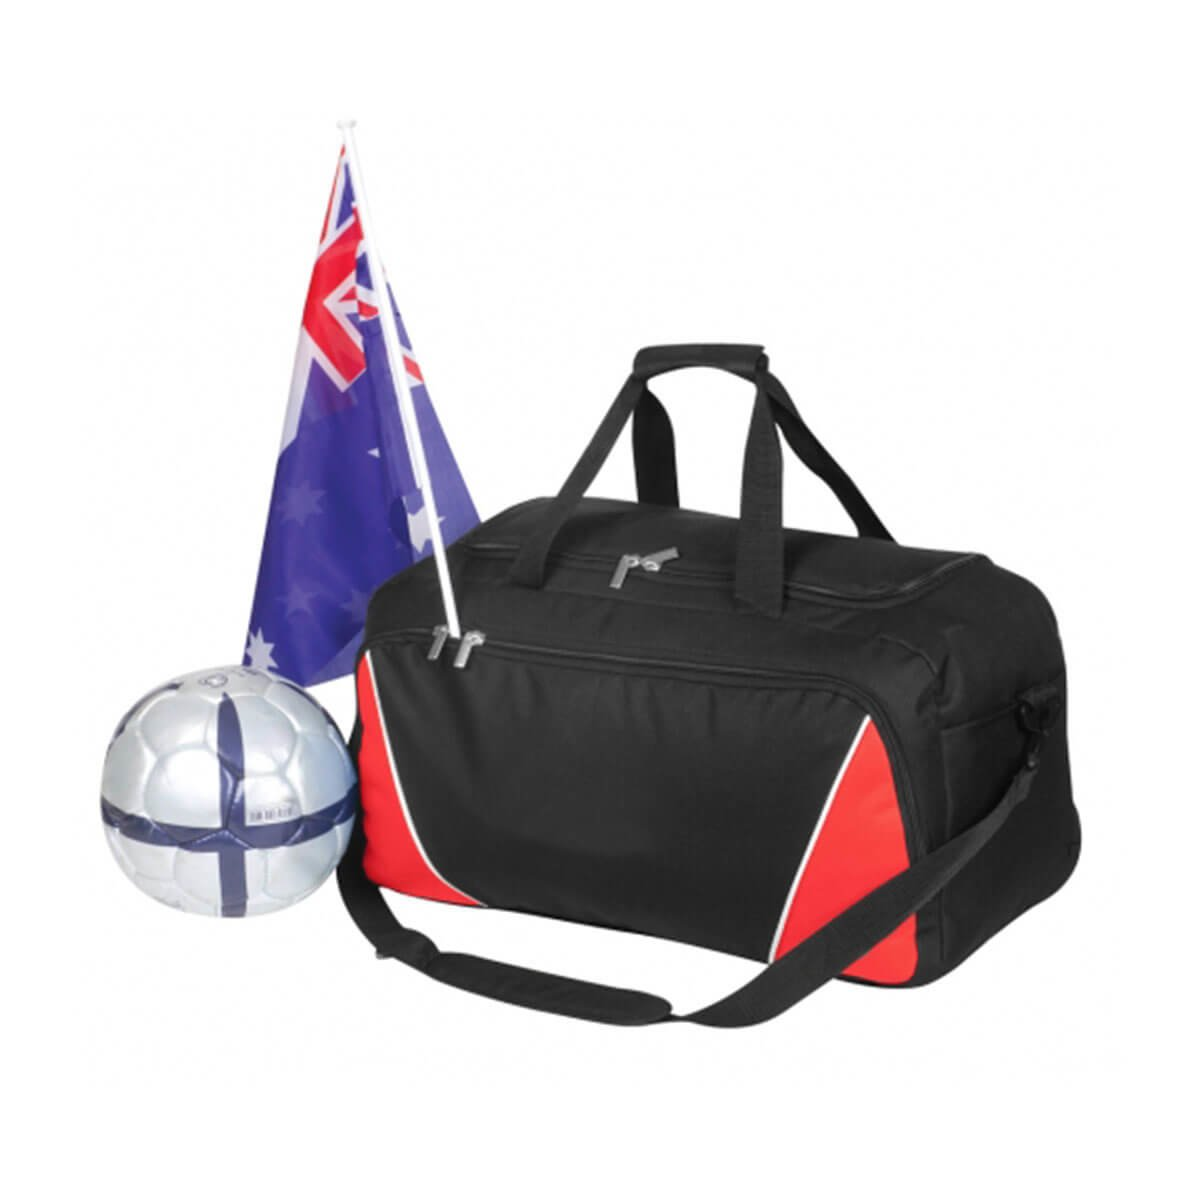 Sports Bag-Black / White / Red